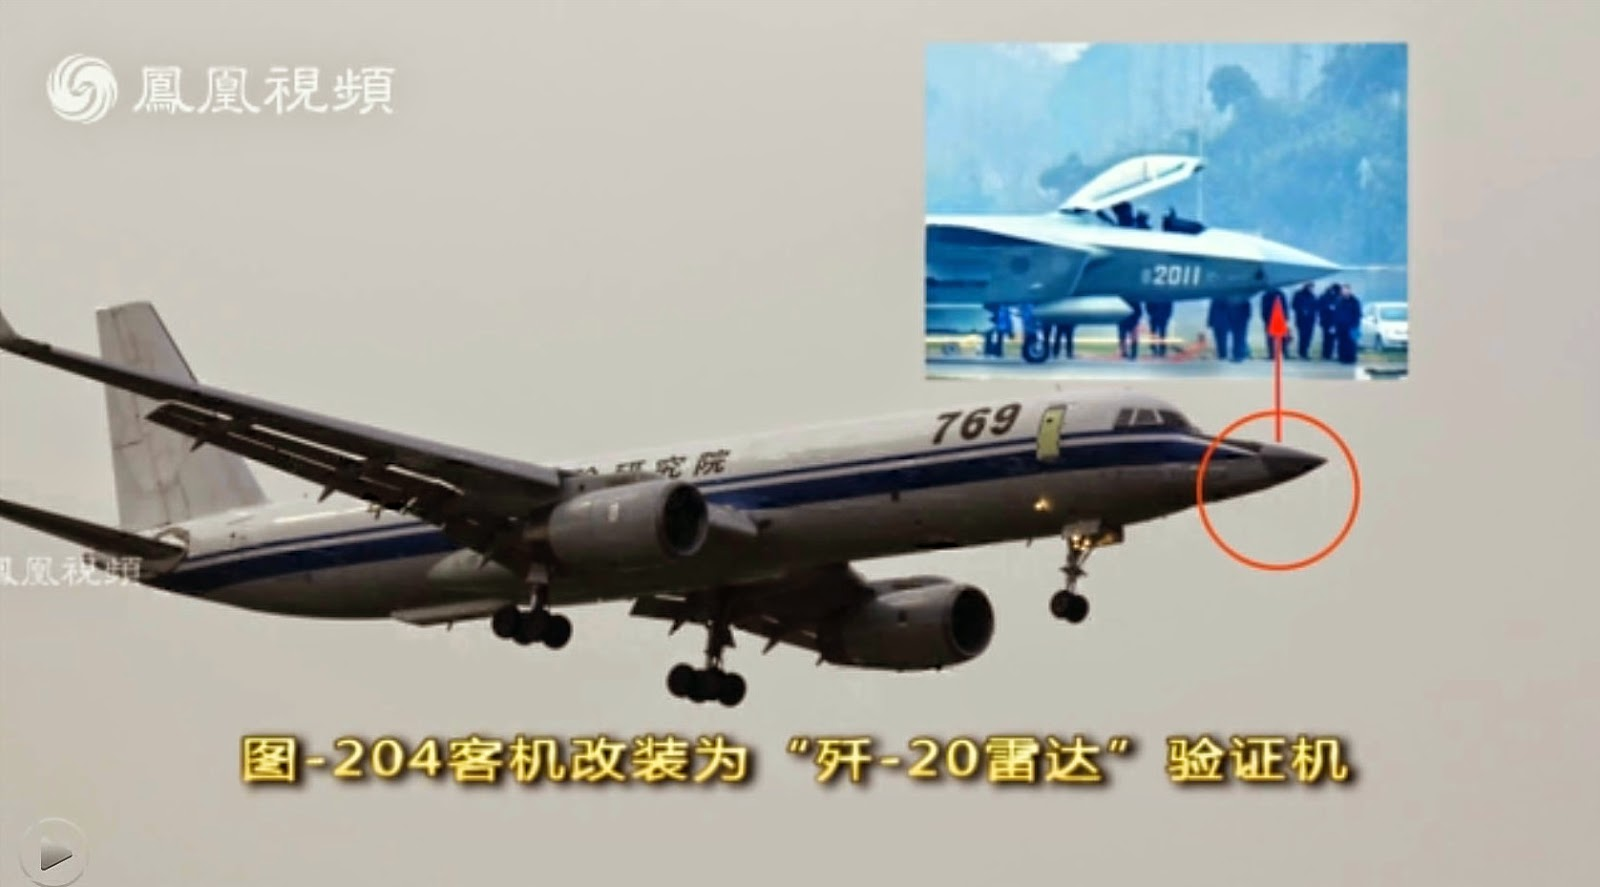 Más detalles del Chengdu J-20 - Página 14 China+tu-204+radar+J-20